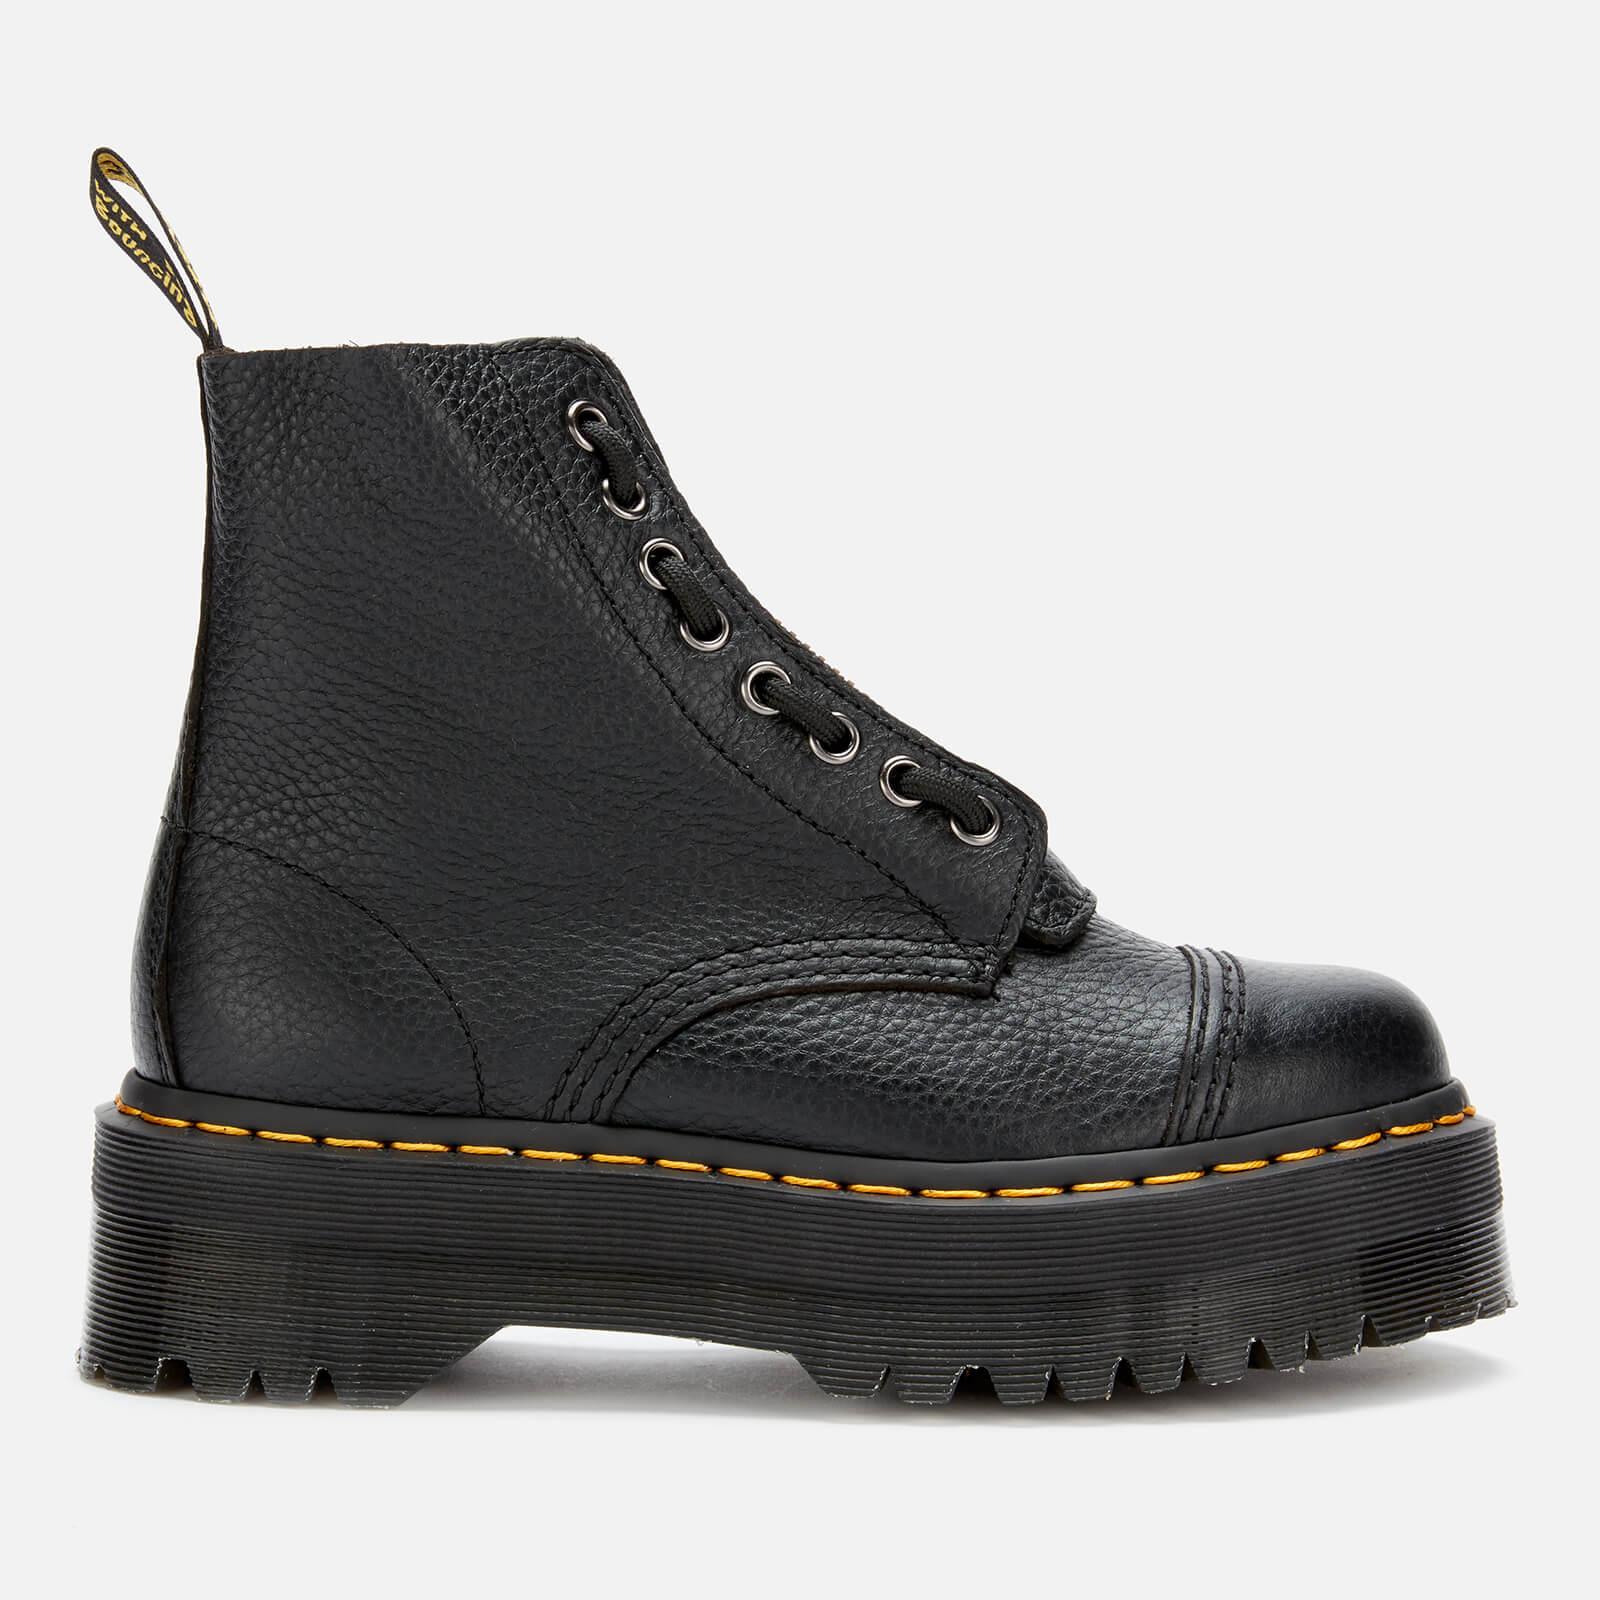 Dr. Martens Women's Sinclair Leather Zip Front Boots - Black - Uk 3 - Schwarz